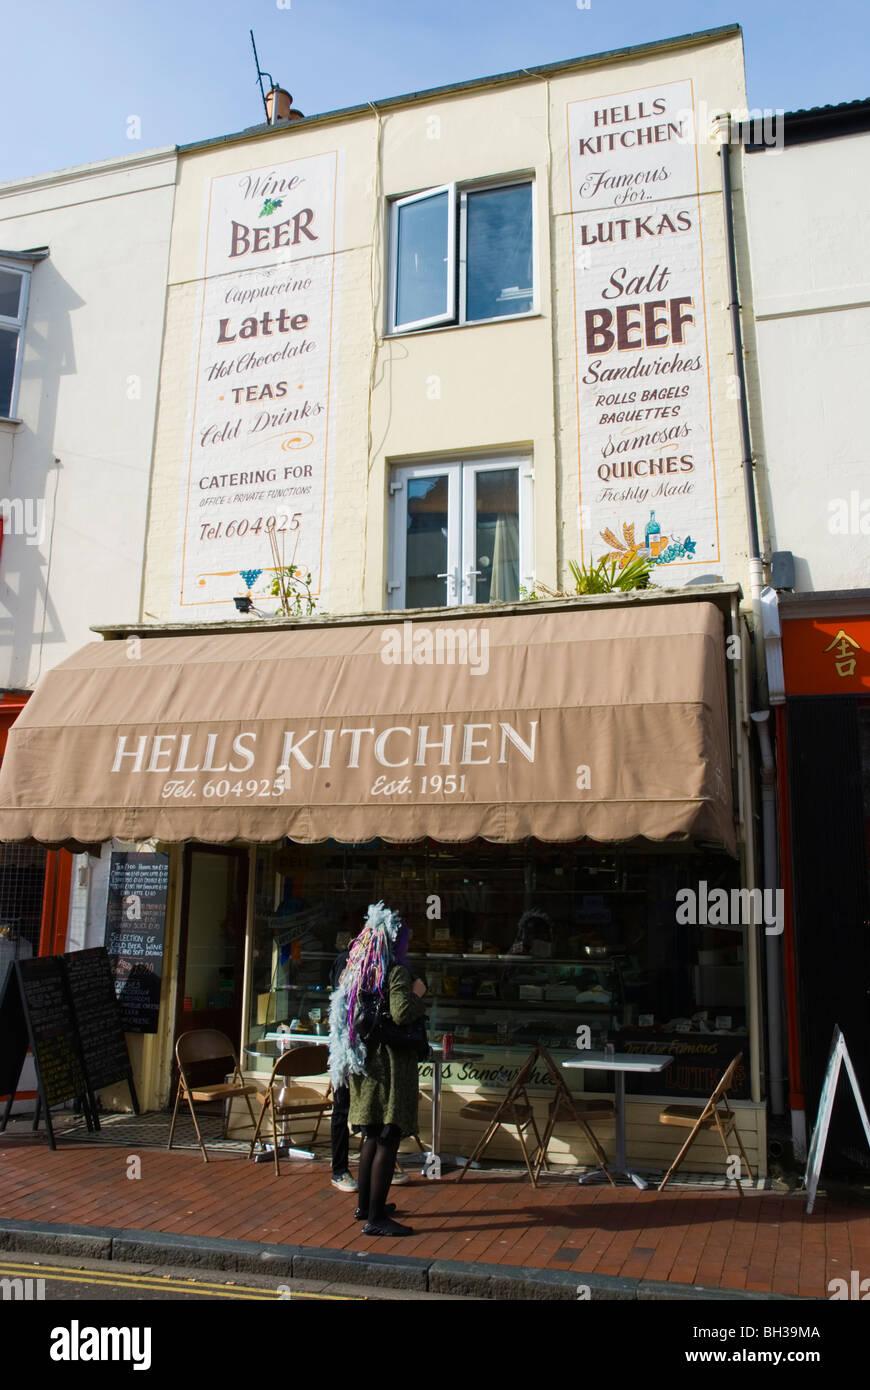 hells kitchen cafe sydney street north laine brighton england uk